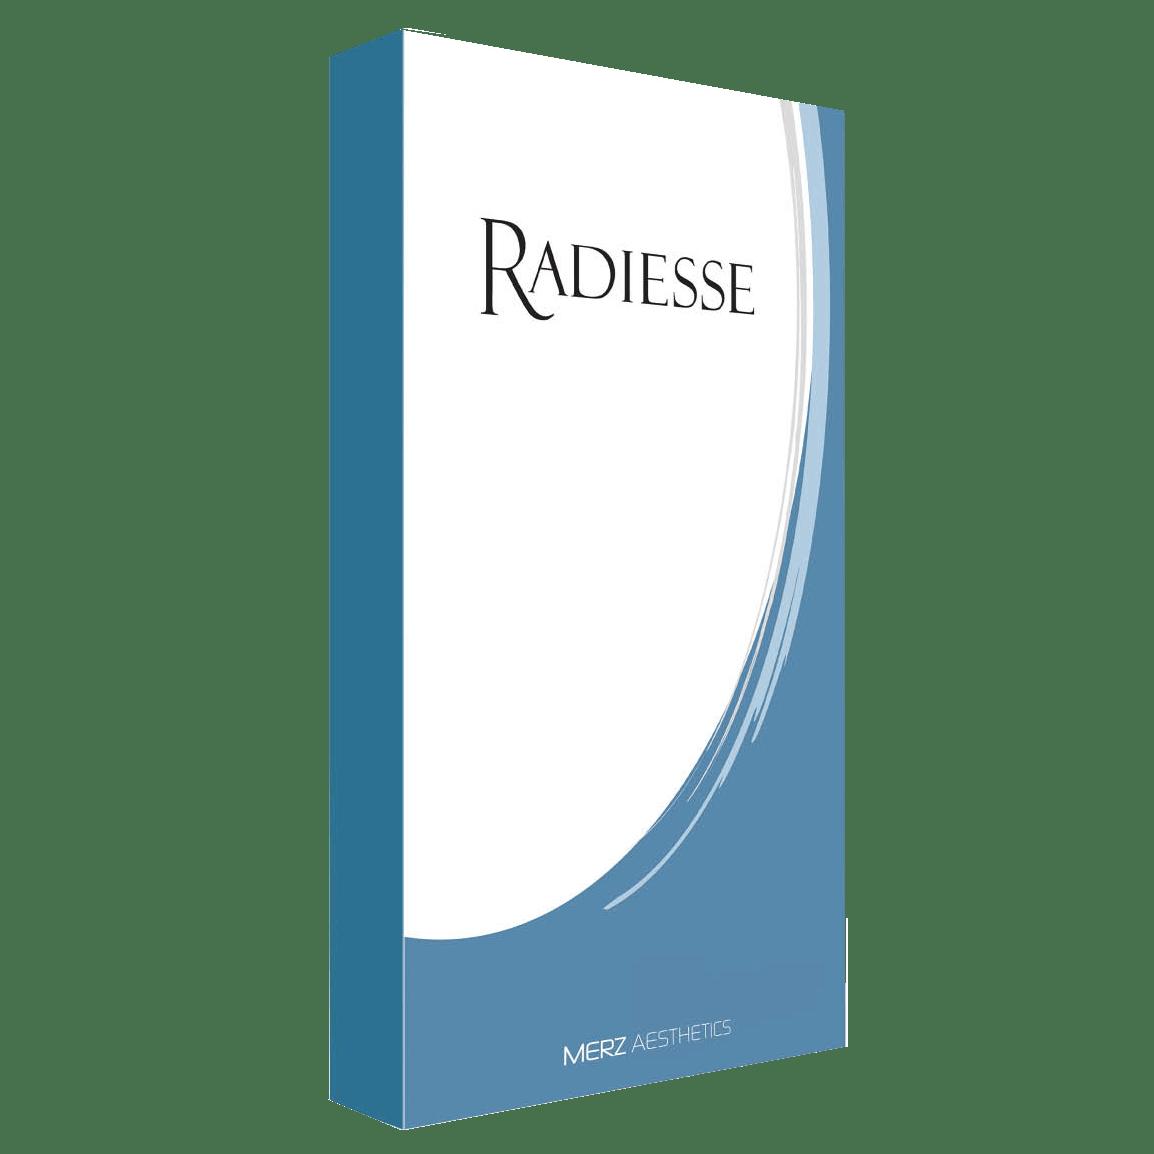 Radiesse (1x1.5ml)